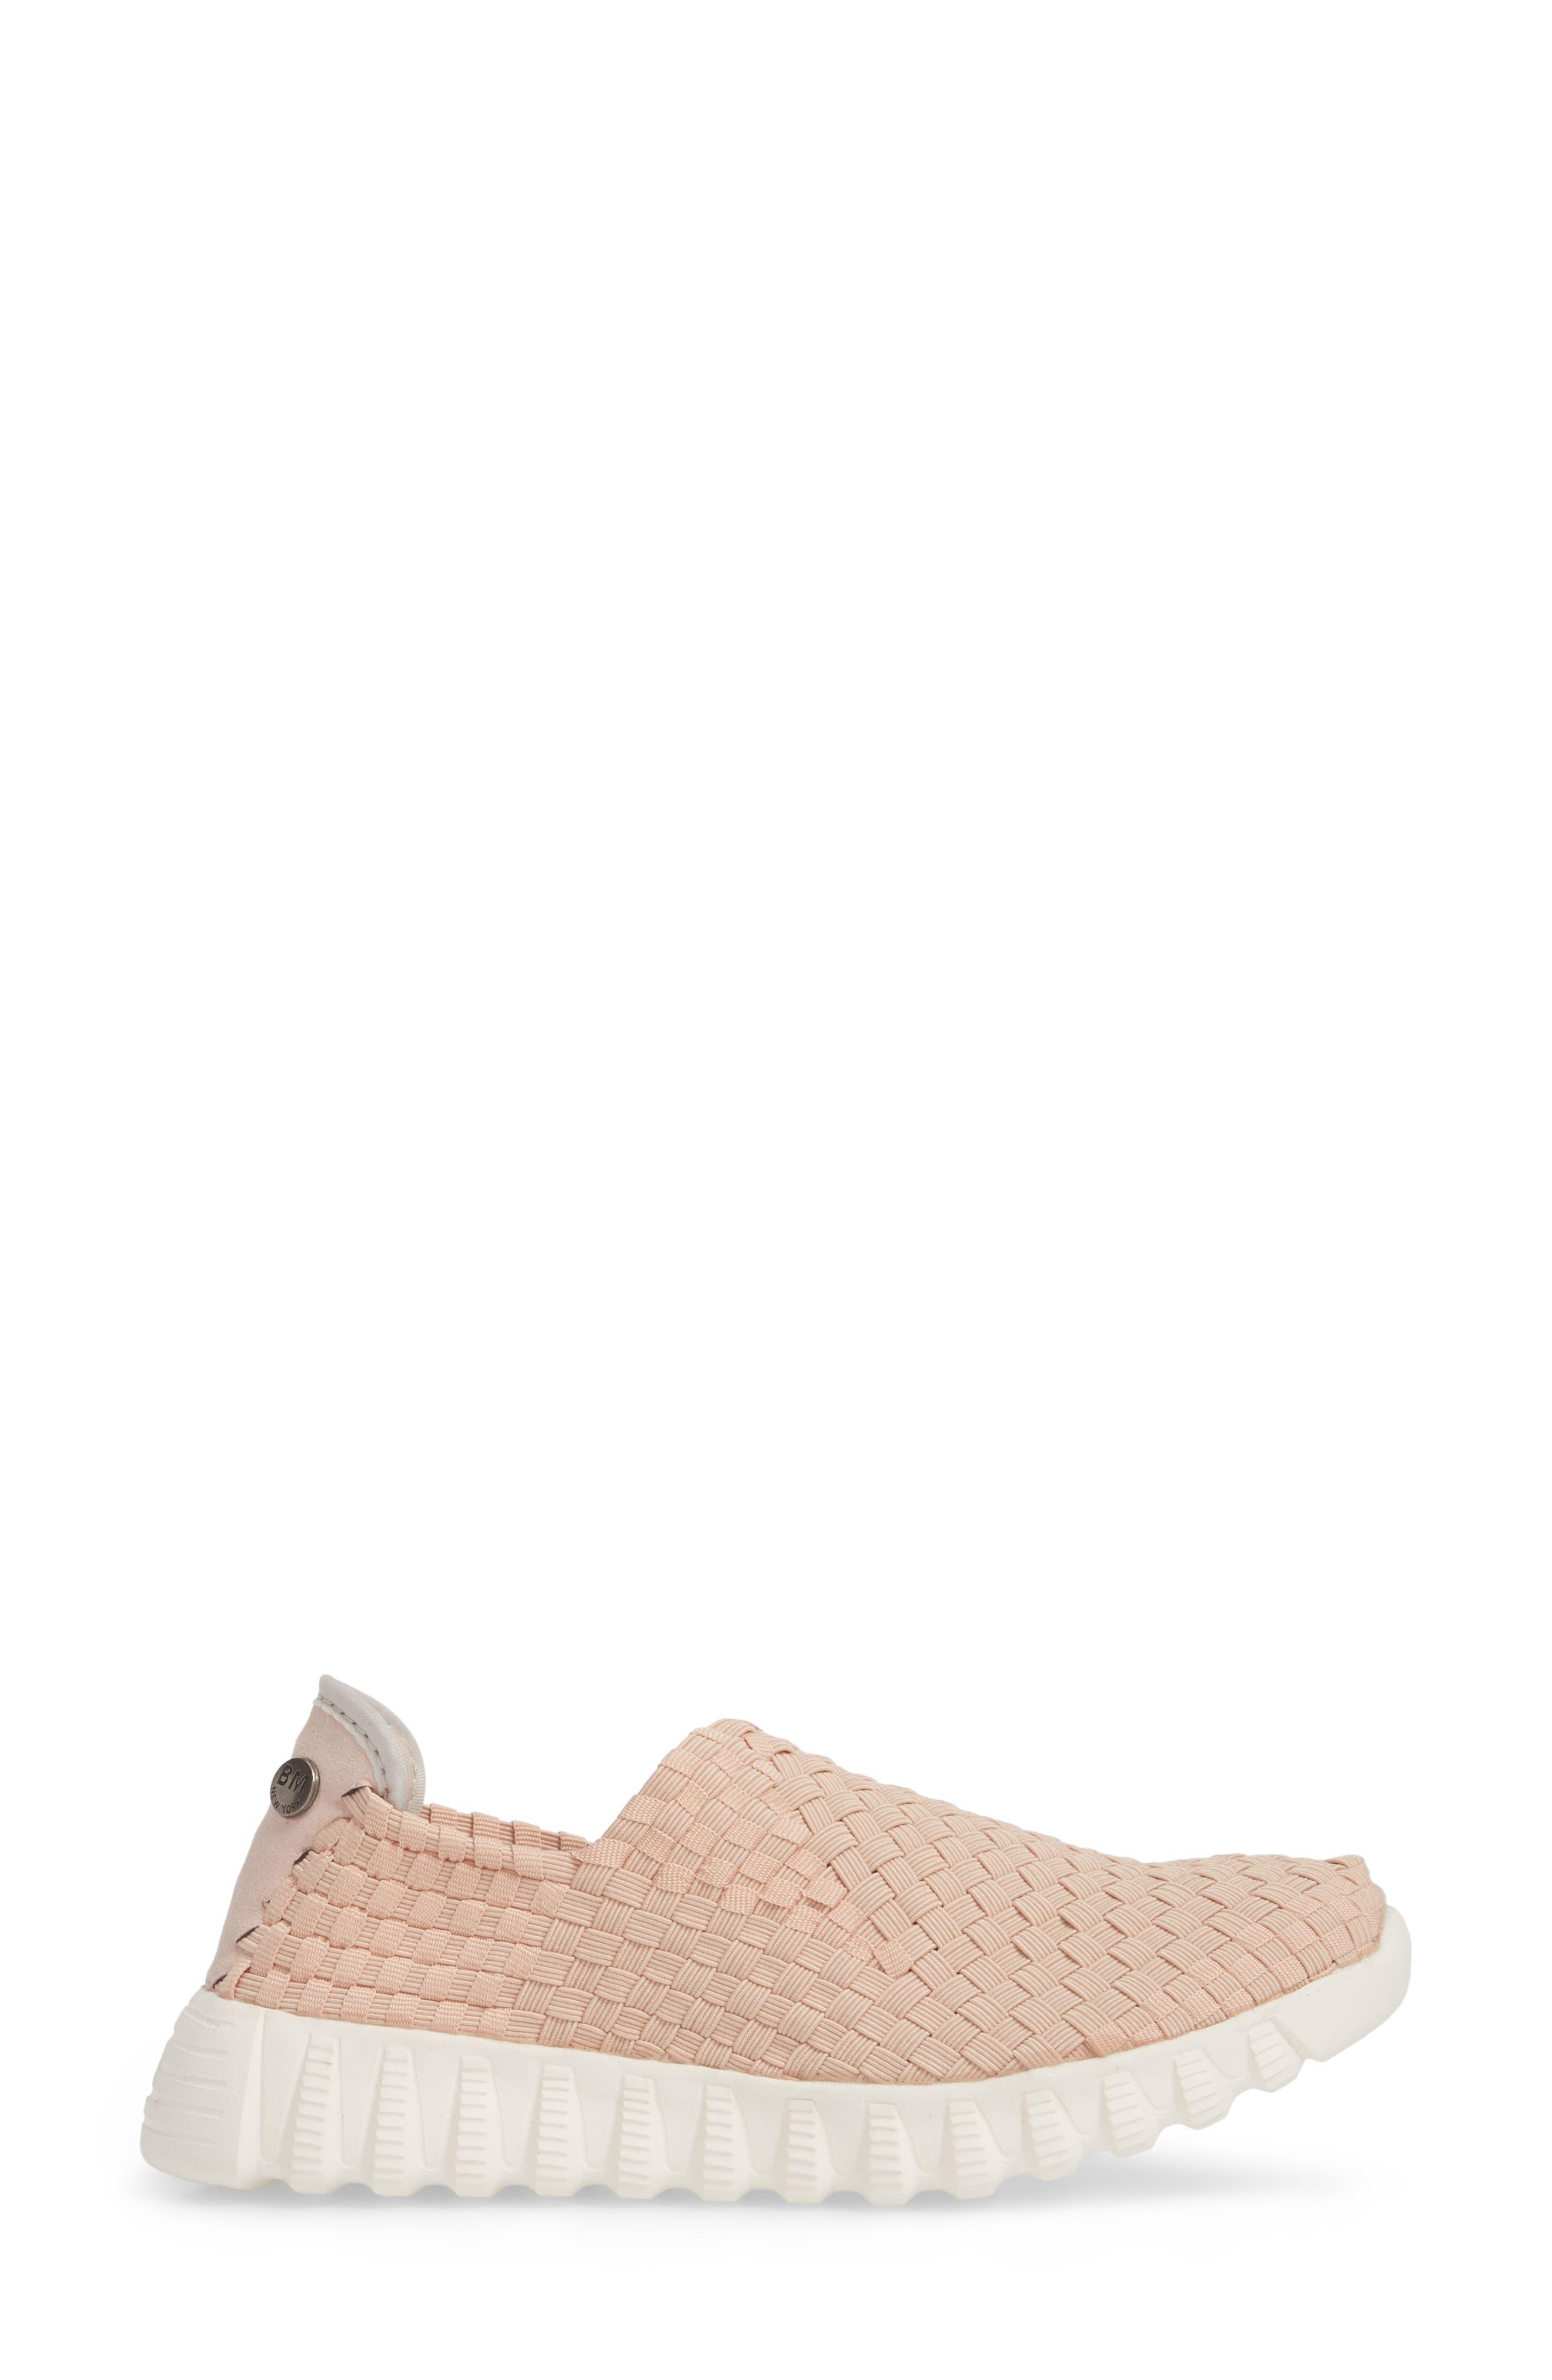 Woven Slip-On Sneaker,                             Alternate thumbnail 3, color,                             Blush Fabric